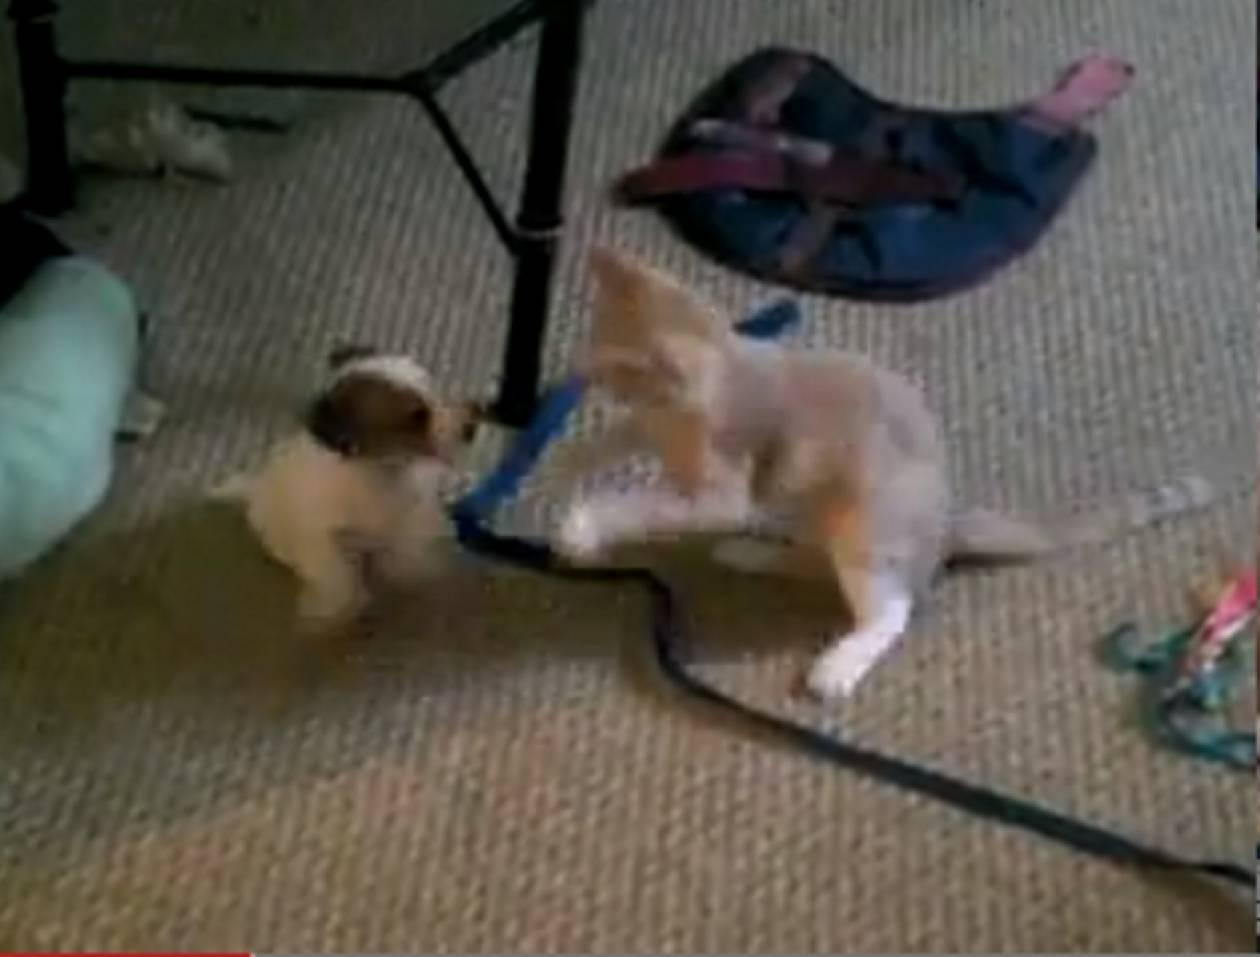 Bίντεο: Δύο κουτάβια «τα έβαλαν» με μία γάτα!